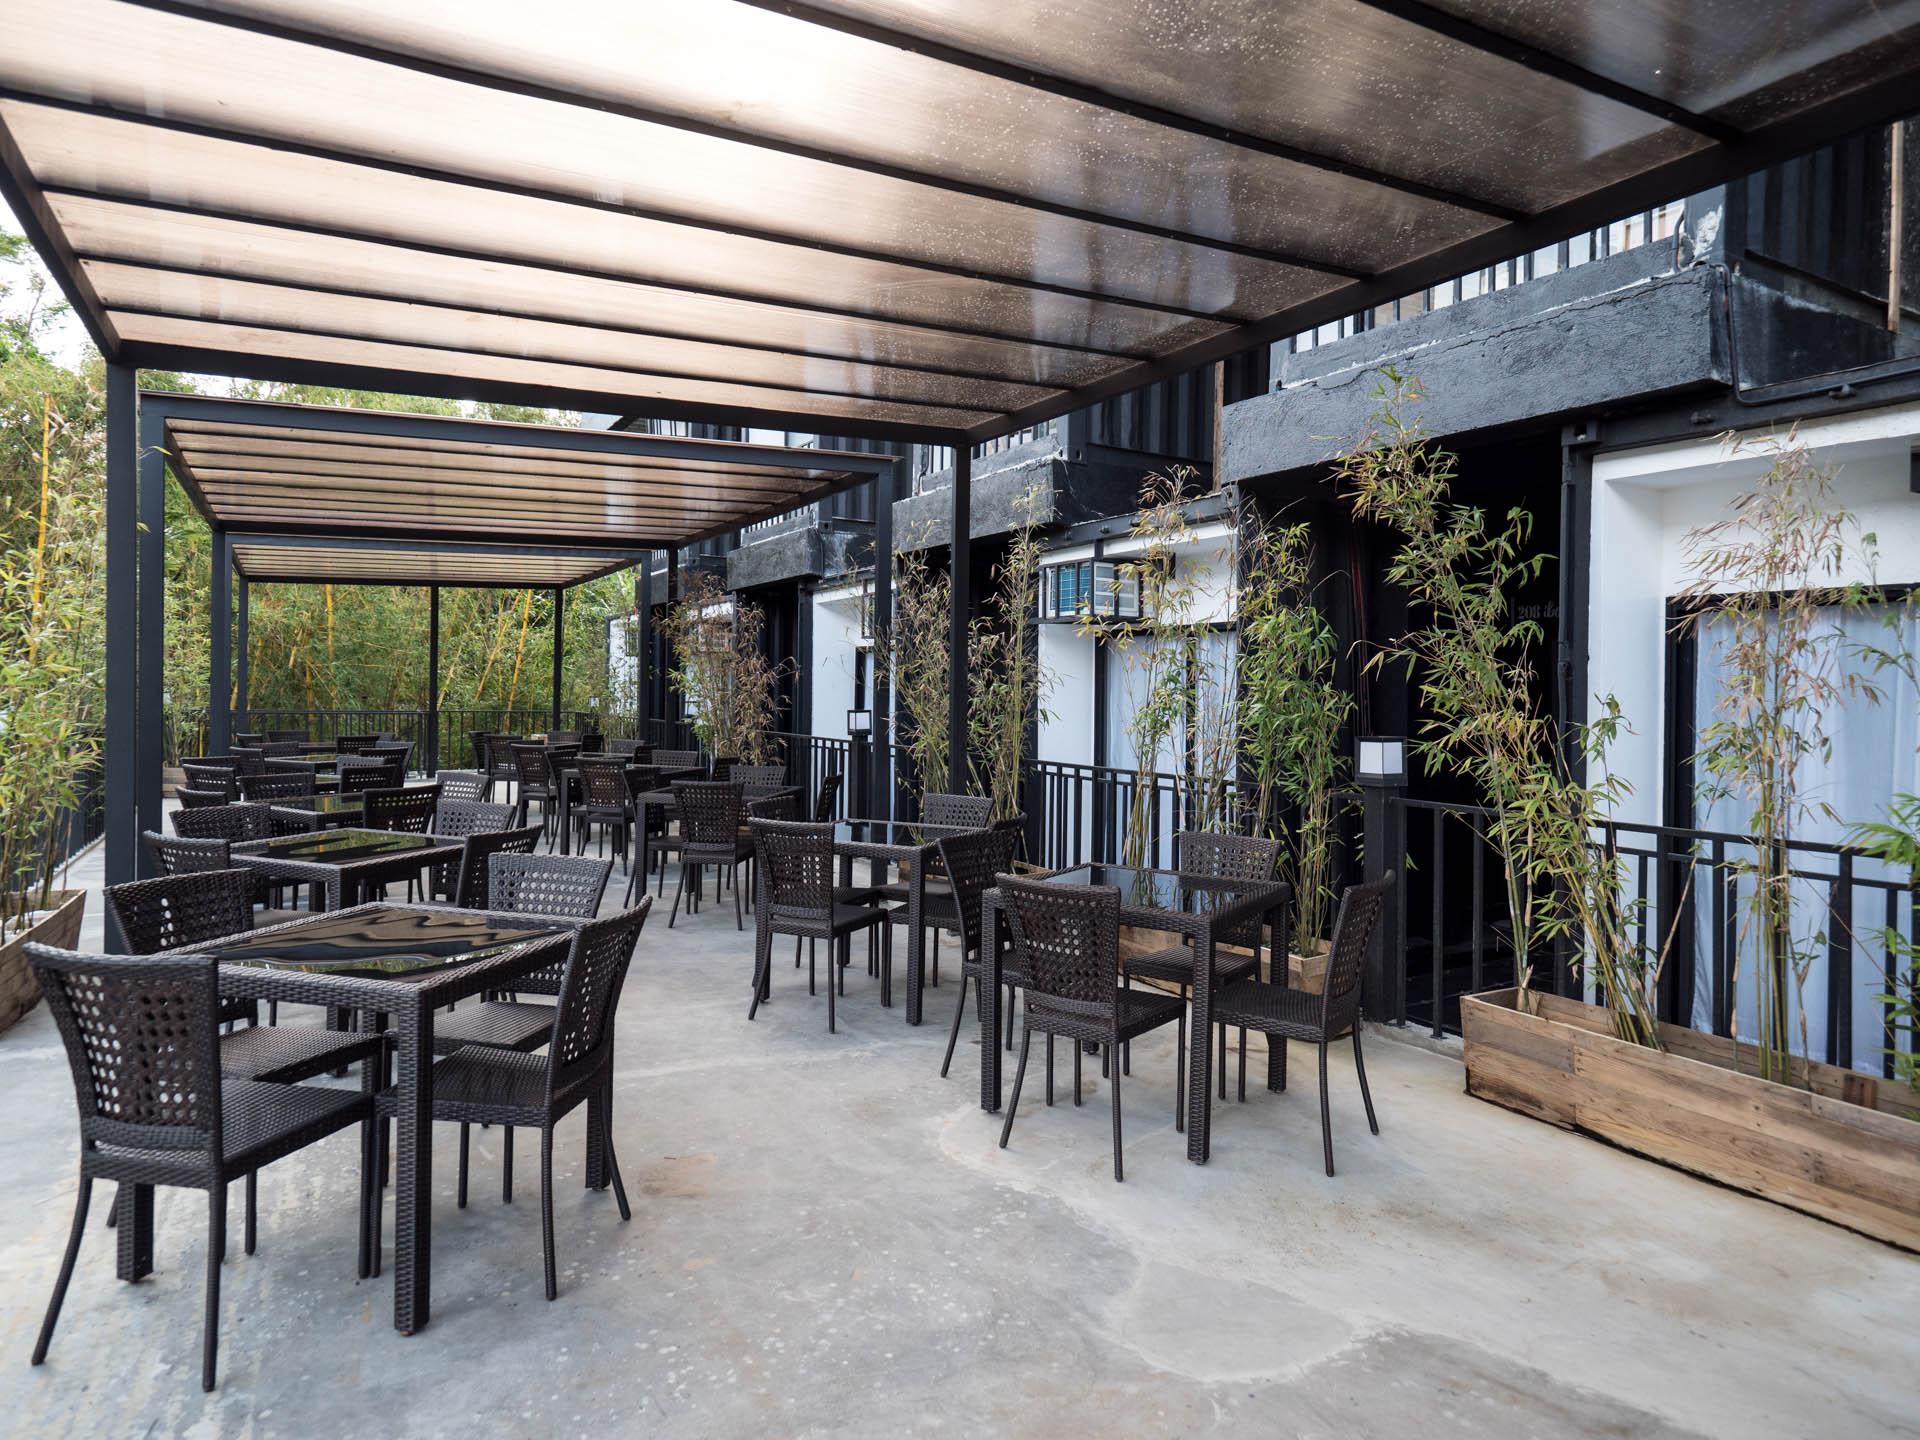 Tagaytay eco hotel salle à manger - Les globe blogueurs - blog voyage nature